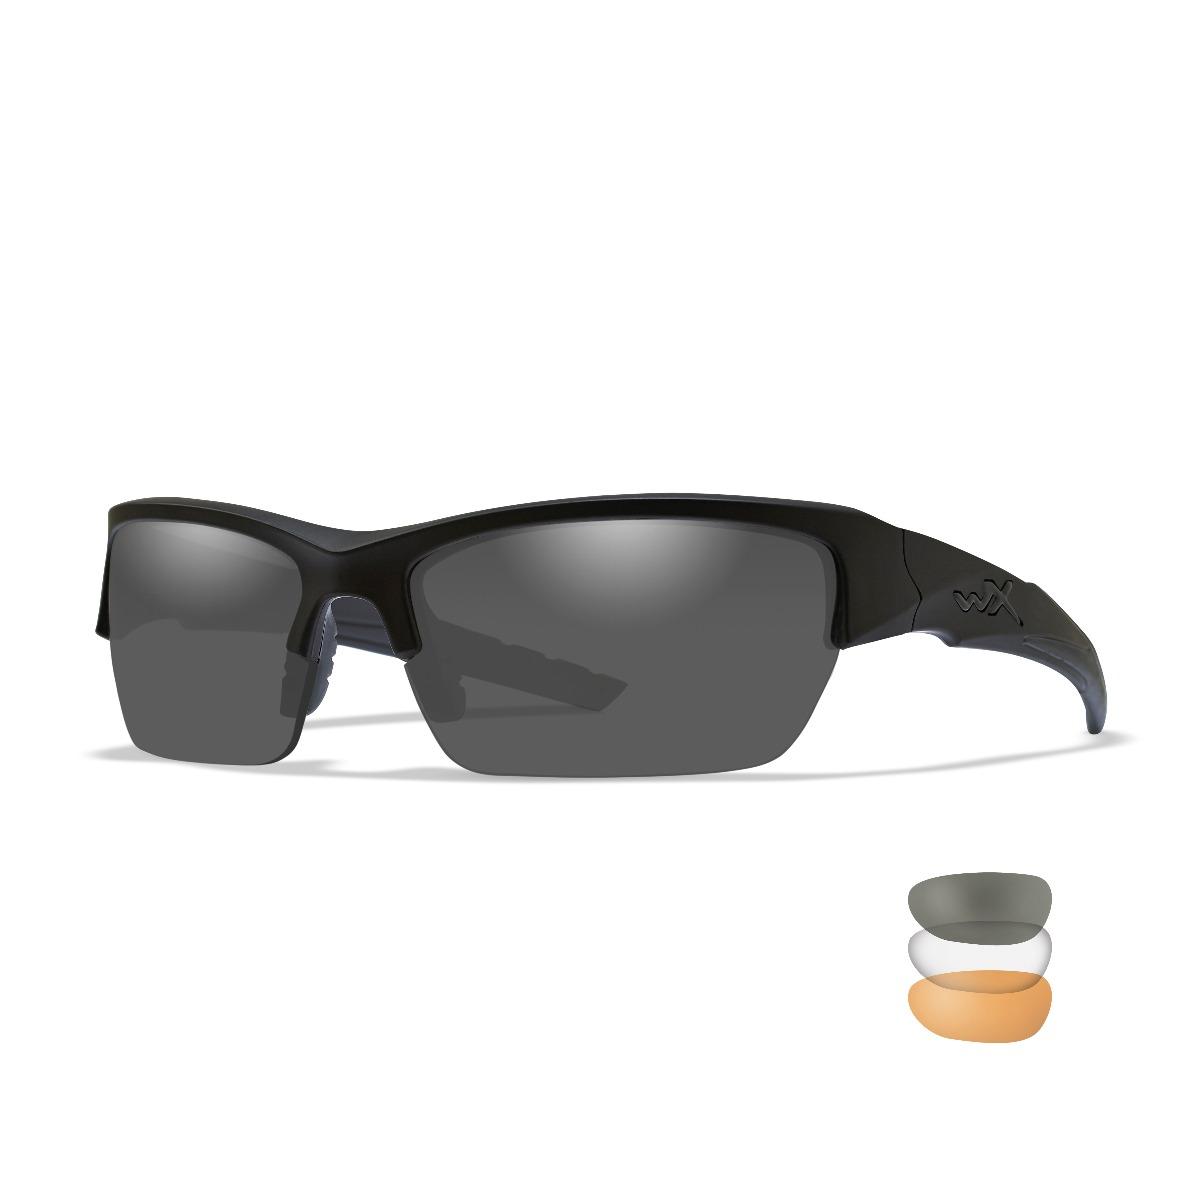 WILEY X Eyewear Valor Safety Glasses Kit Matte Black Frame